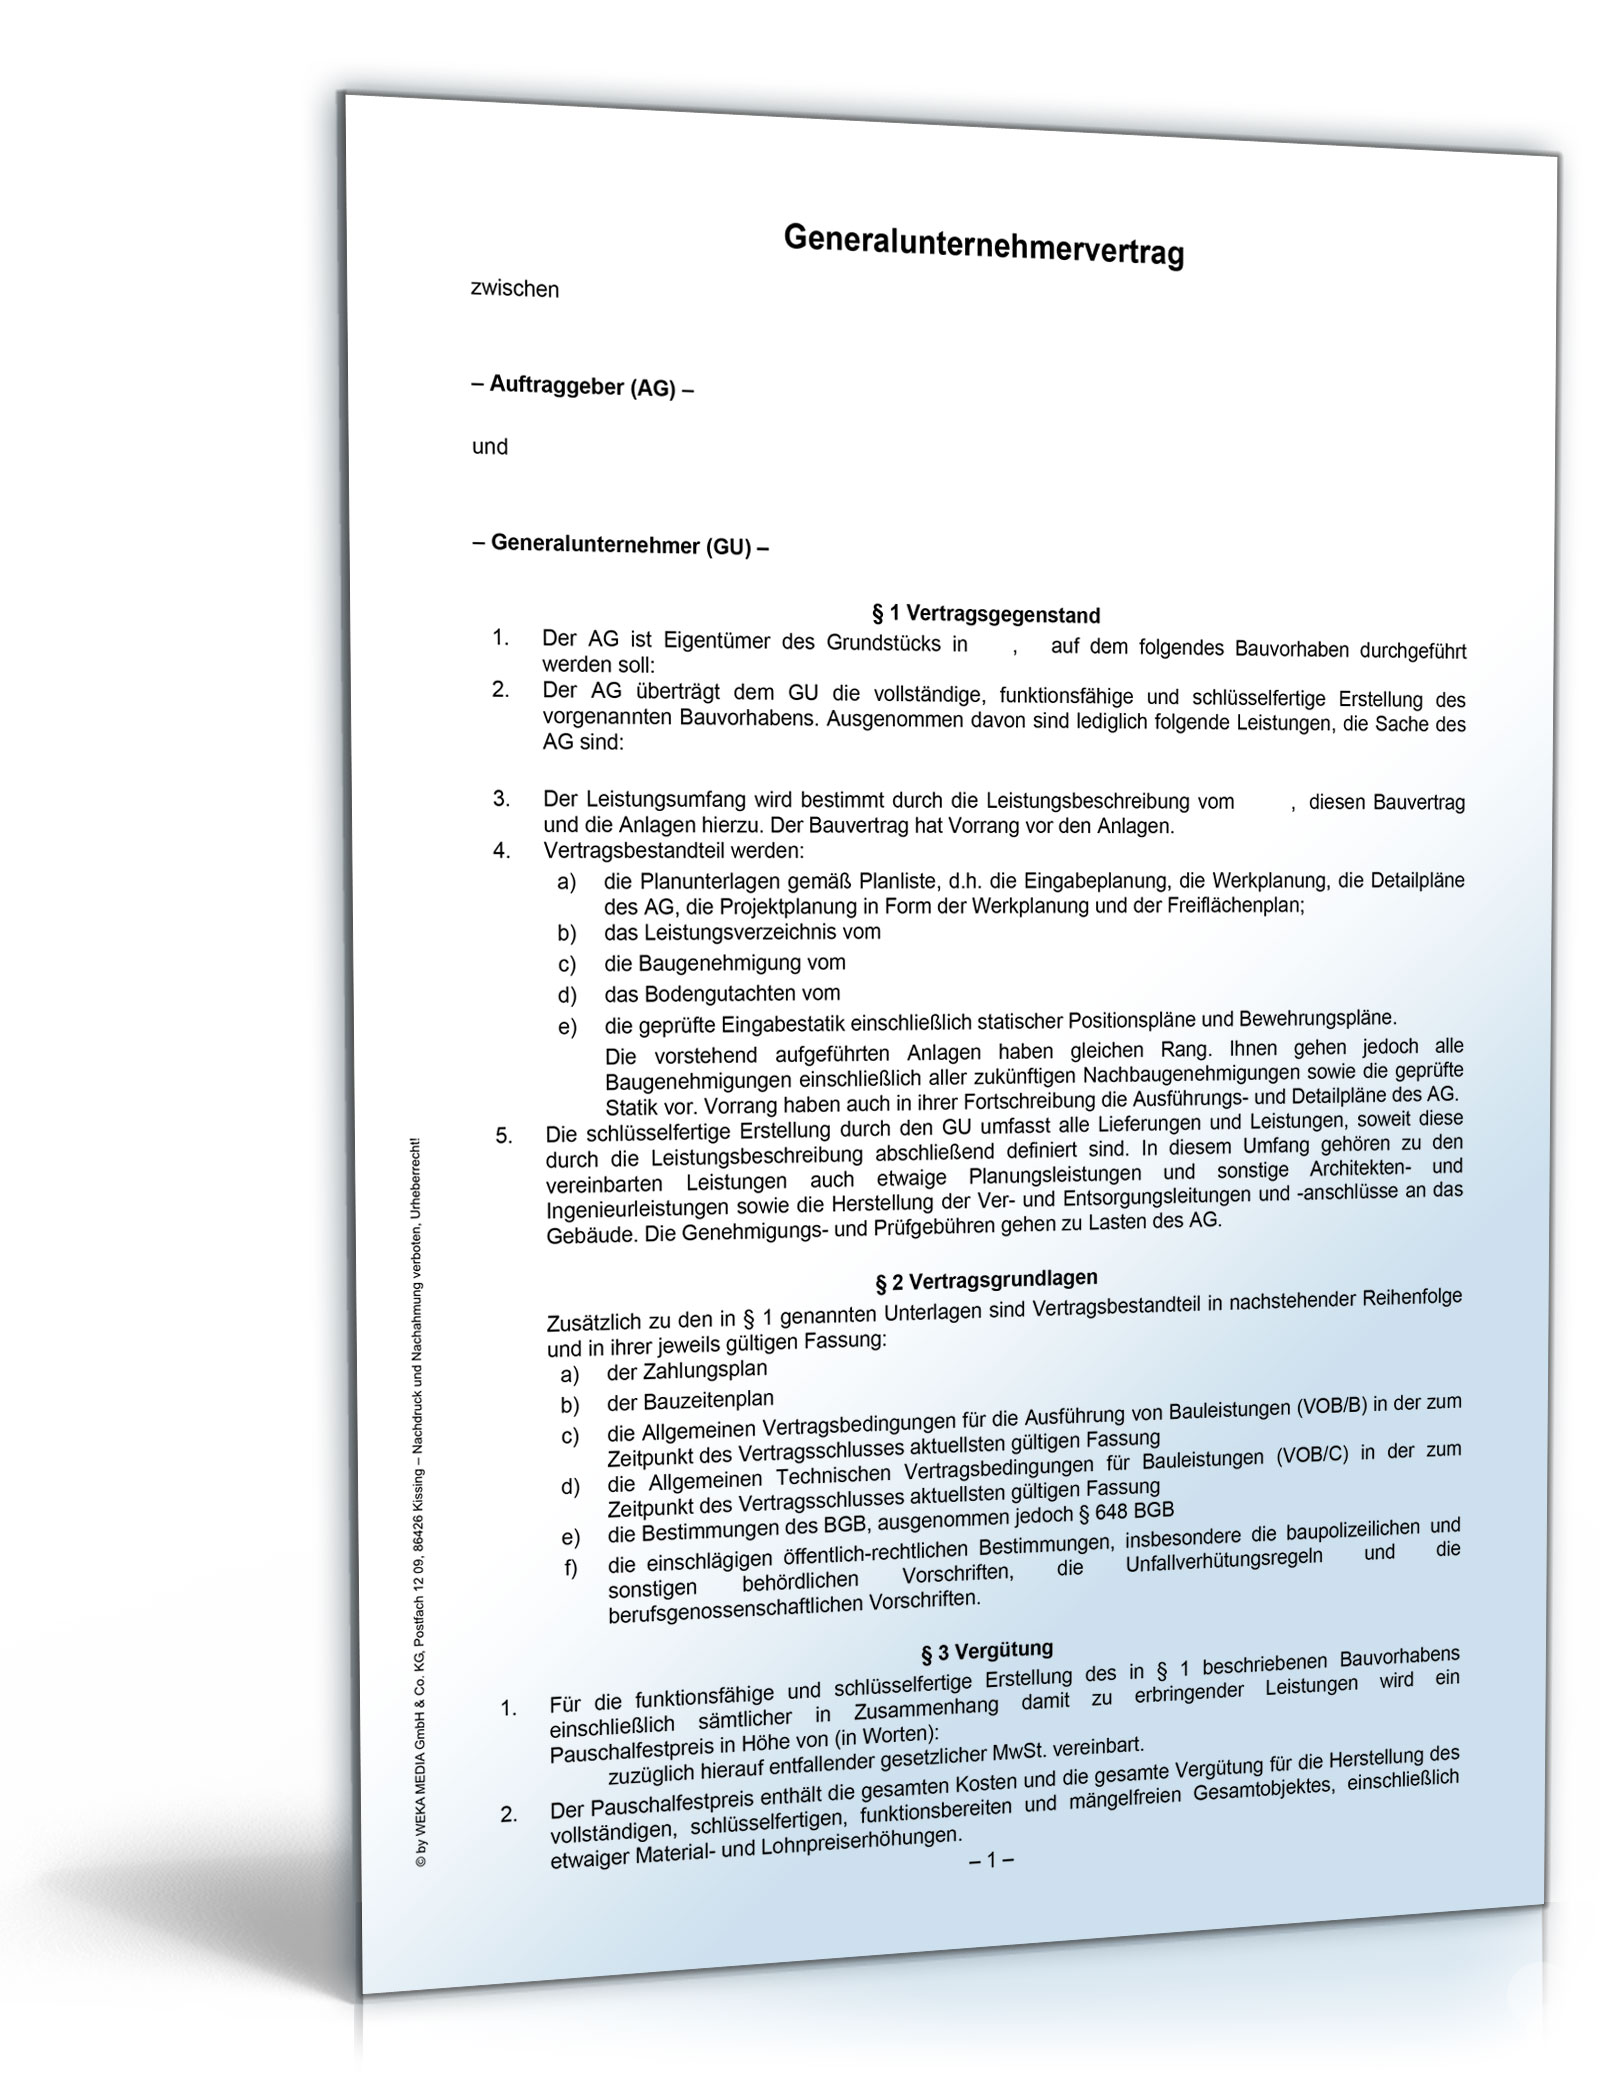 Generalunternehmervertrag [Word Dokument]: Amazon.de: Software